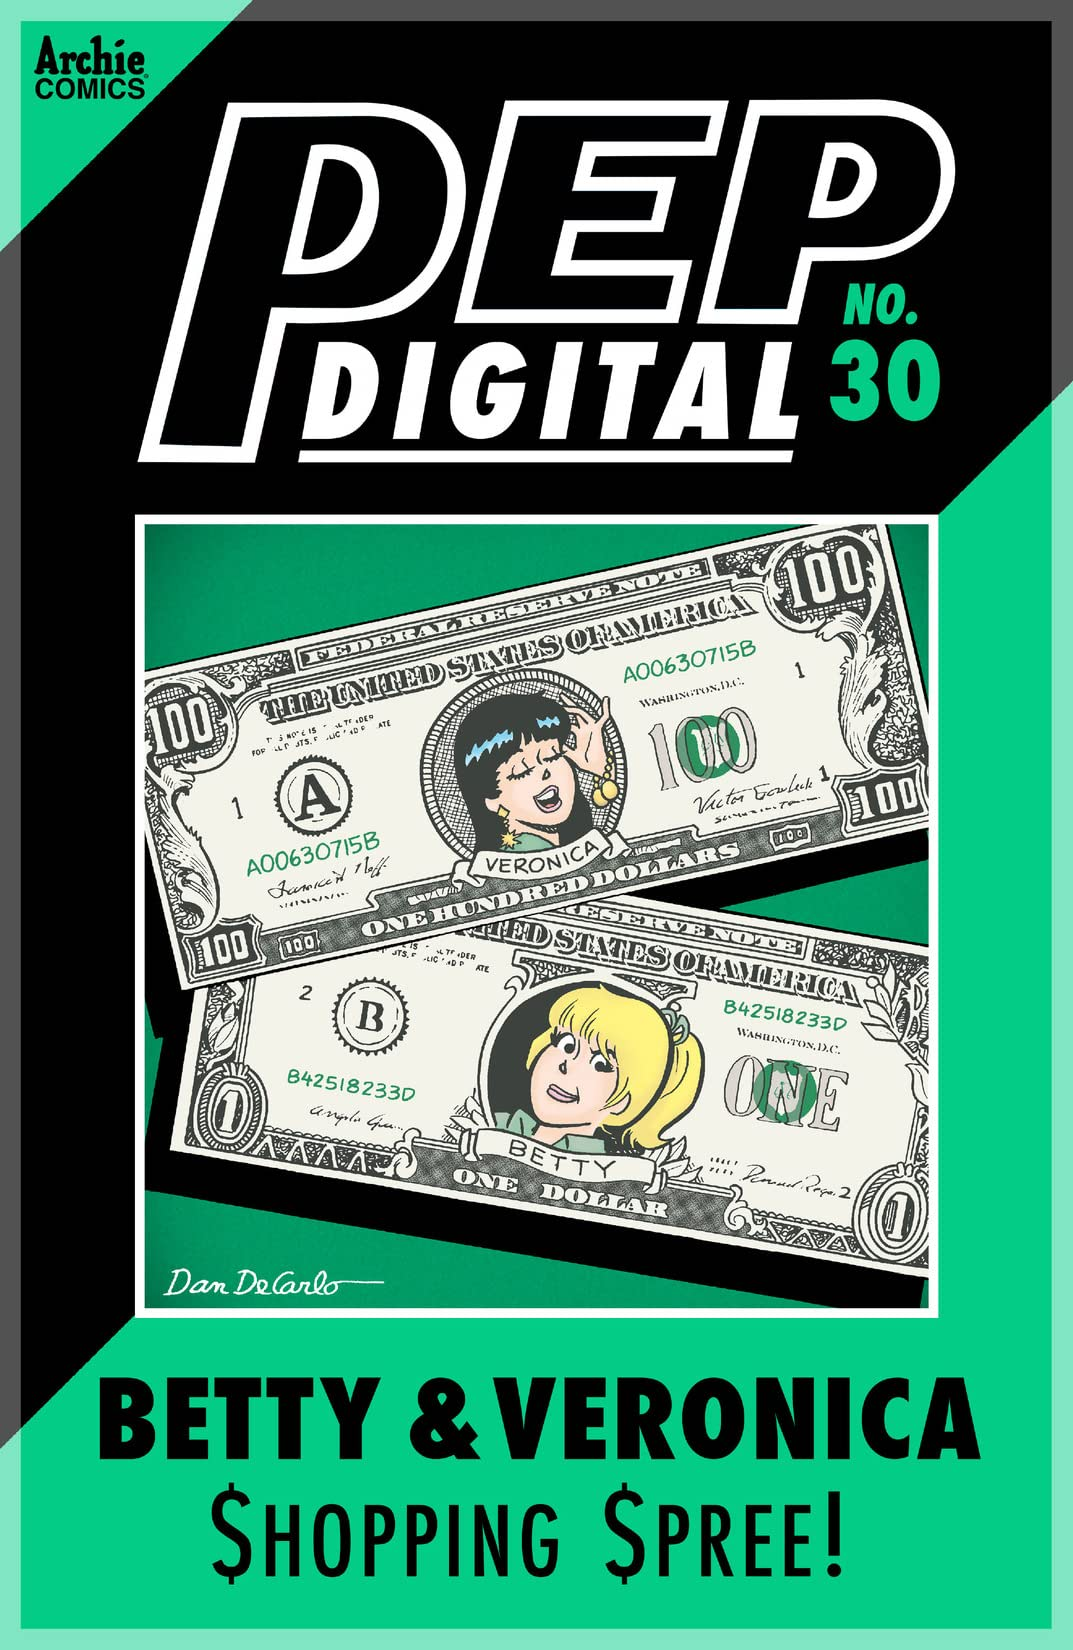 PEP Digital #30: Betty & Veronica $hopping $pree!